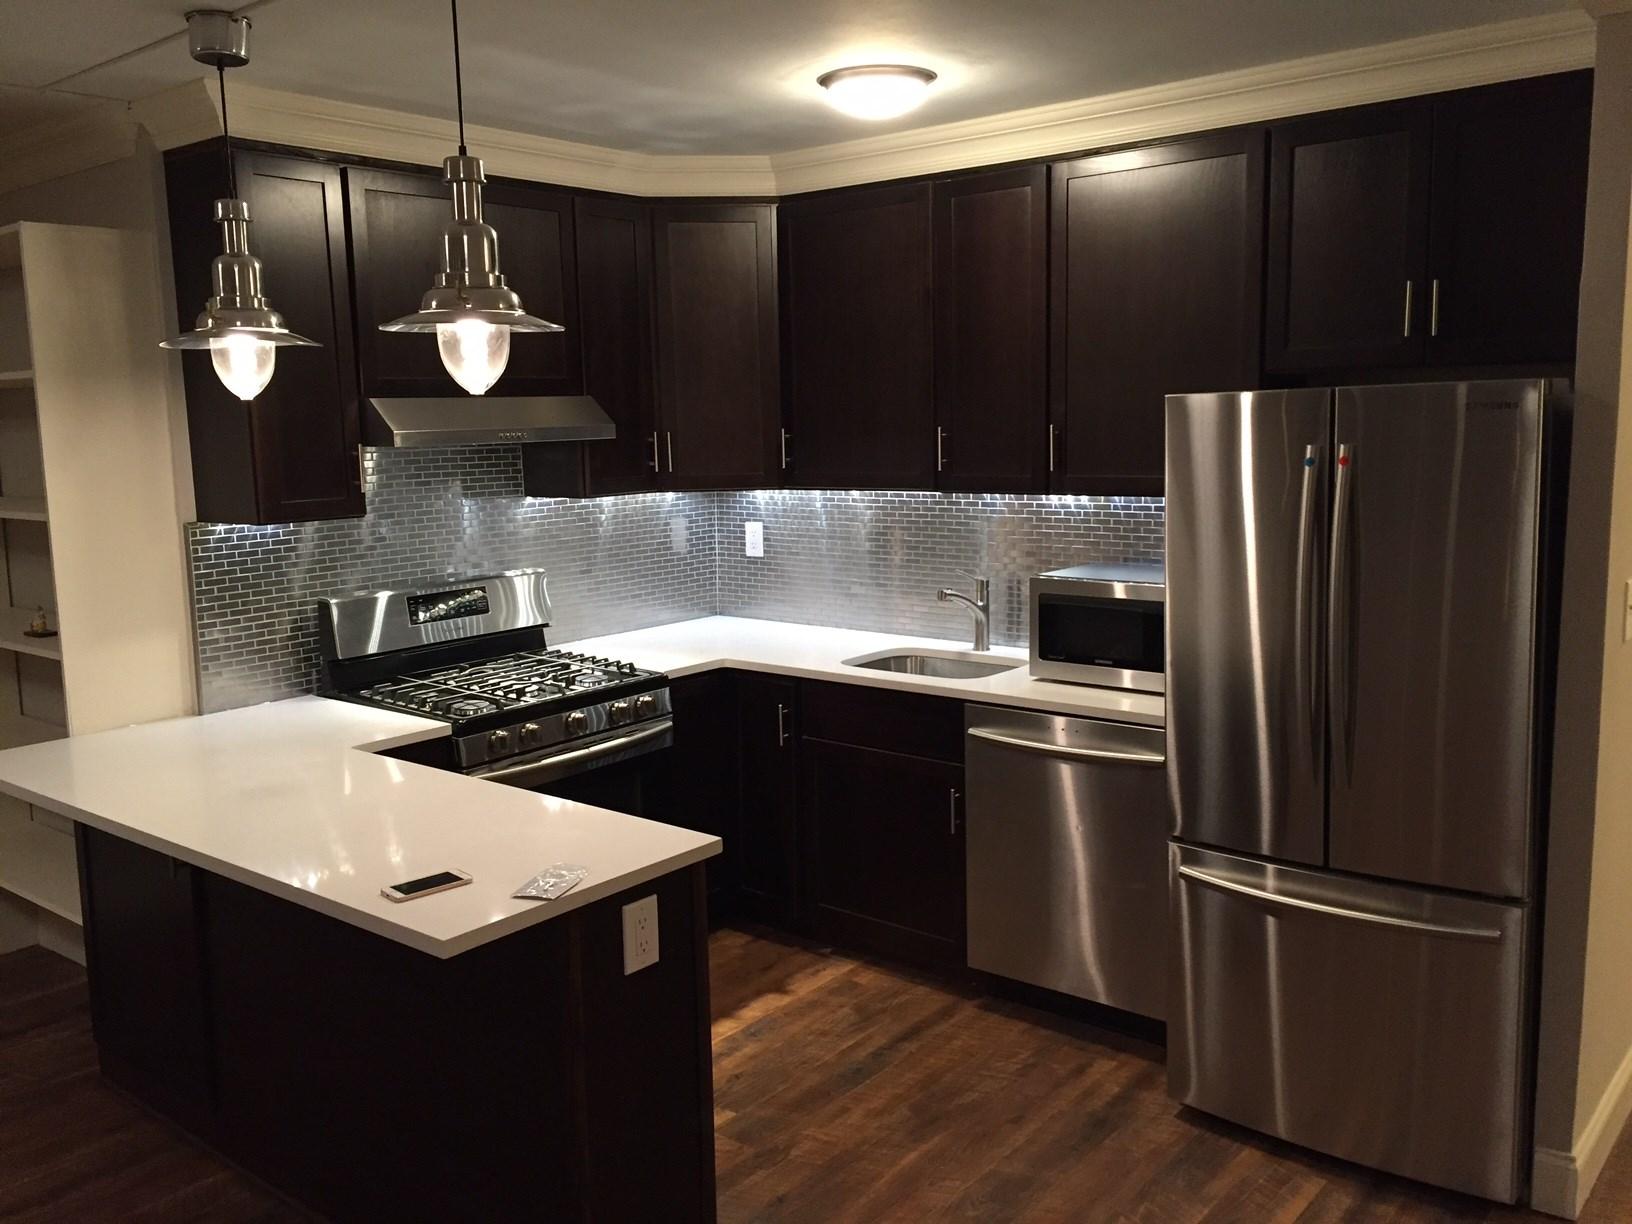 1 Bedroom Apartment To Rent In New Jersey Area Single Bedroom Apartment 1bhk Flats Rentals